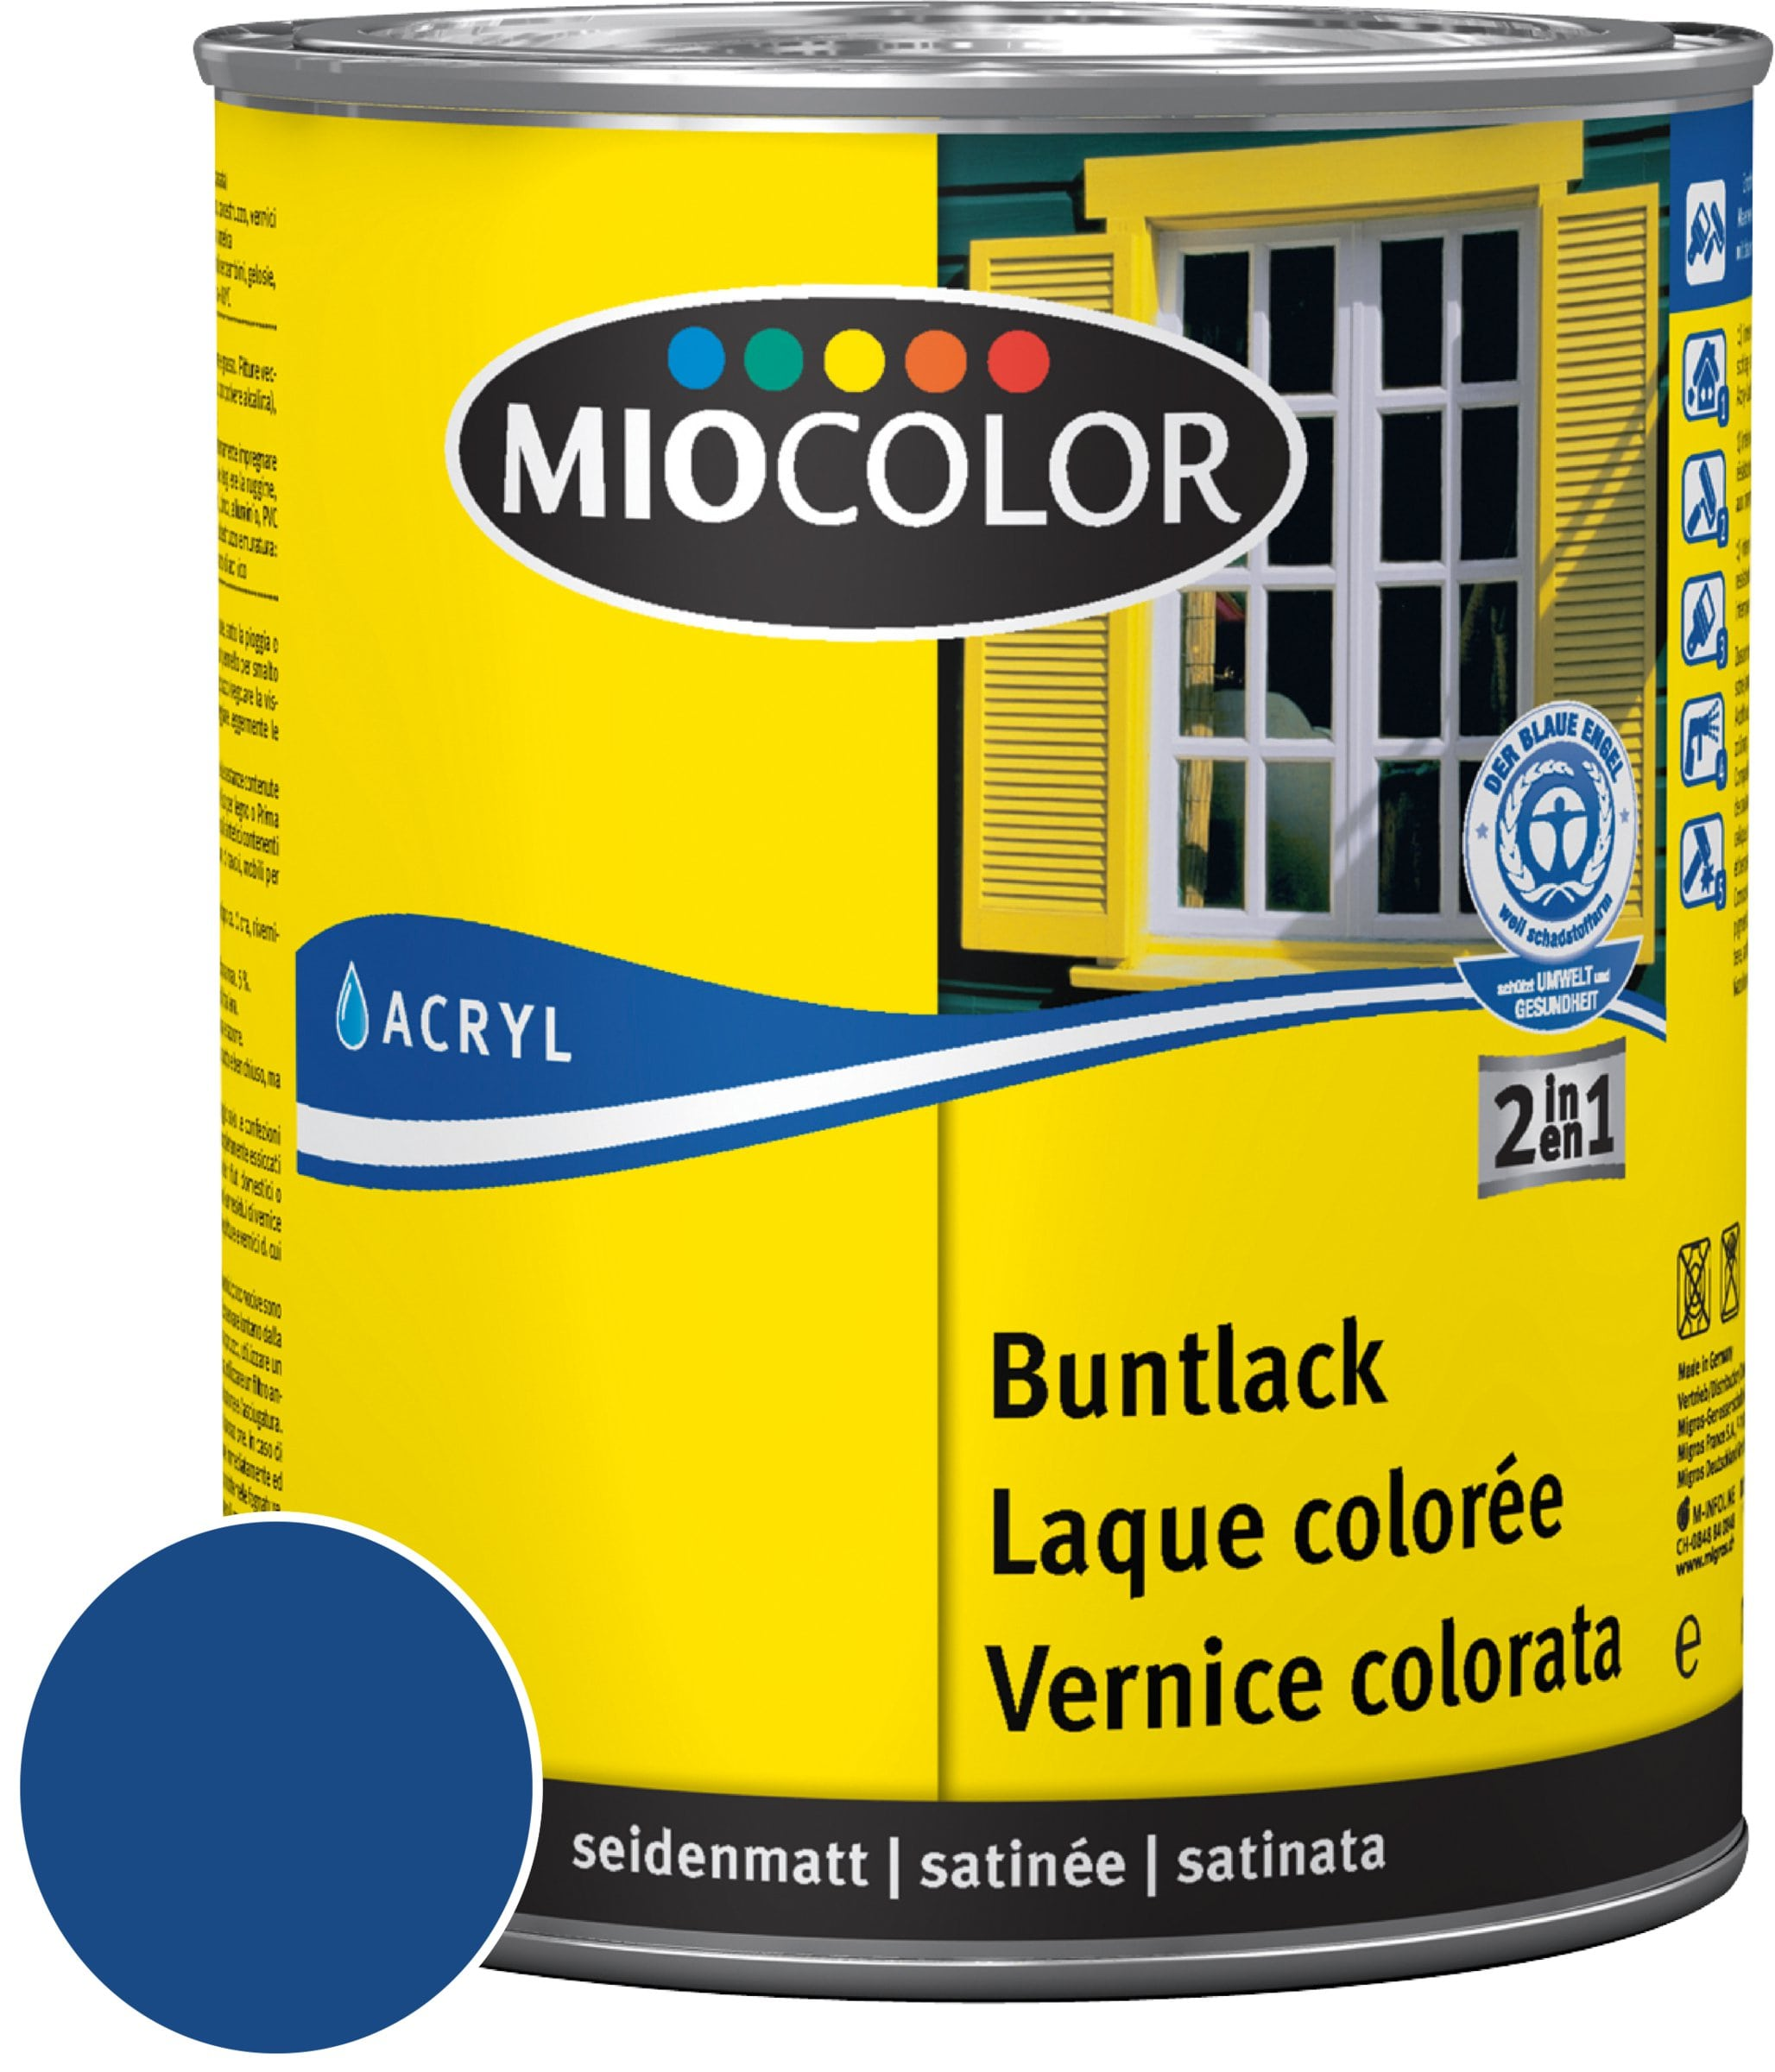 Miocolor Acryl Buntlack seidenmatt Enzianblau 125 ml